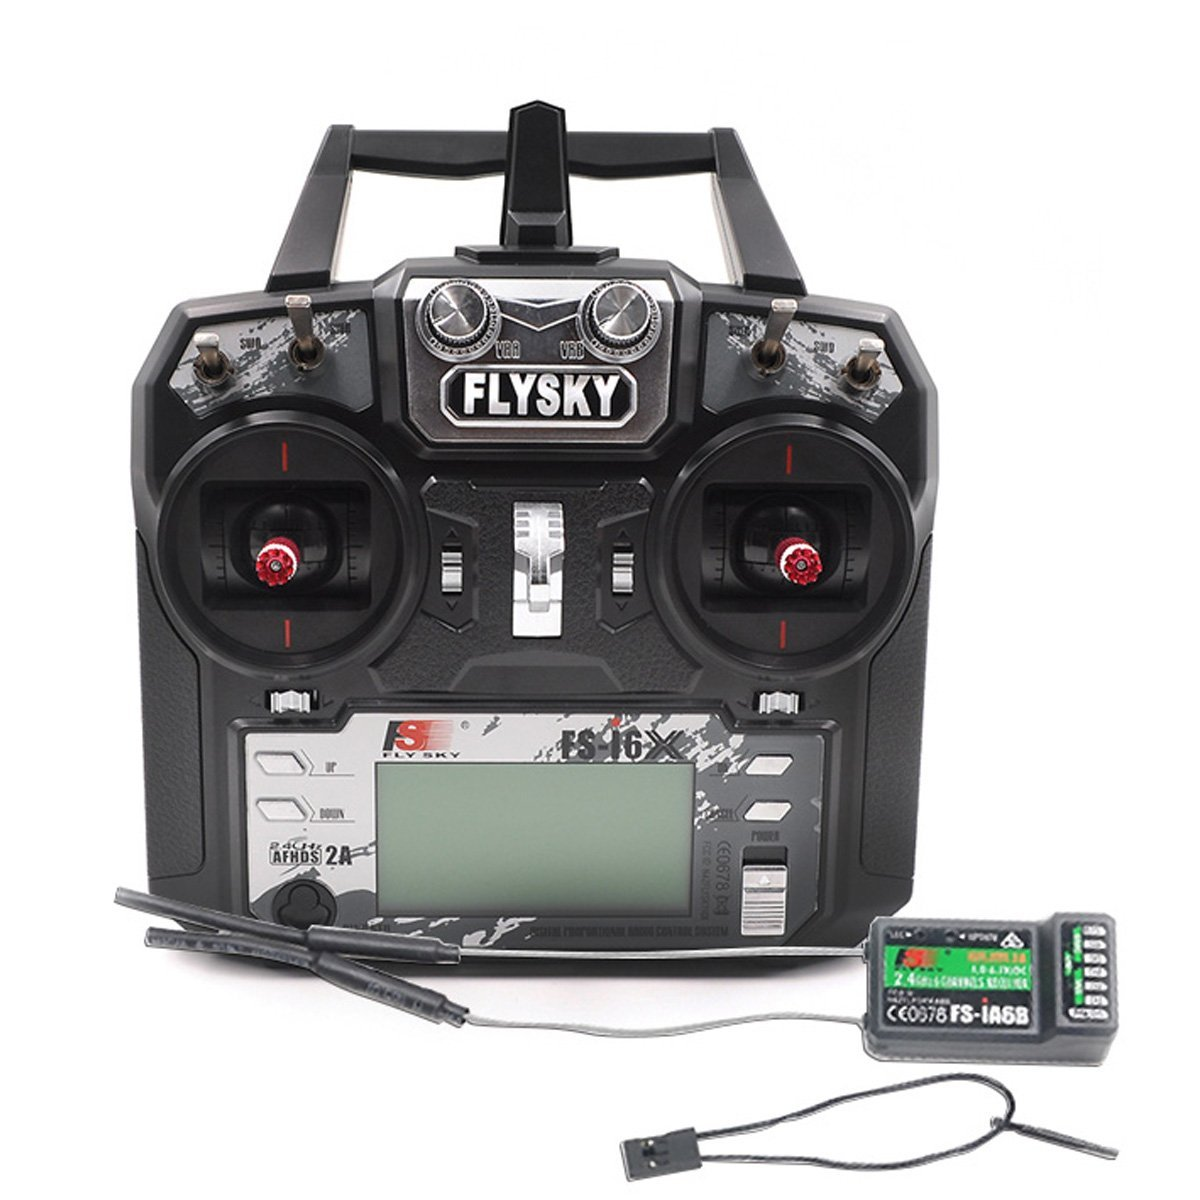 Flysky FS-i6X FS I6X 2.4G RC Transmitter Remote Controller 10/6CH iA10B or iA6B Receiver i6 upgrade For RC Multi-rotor drone